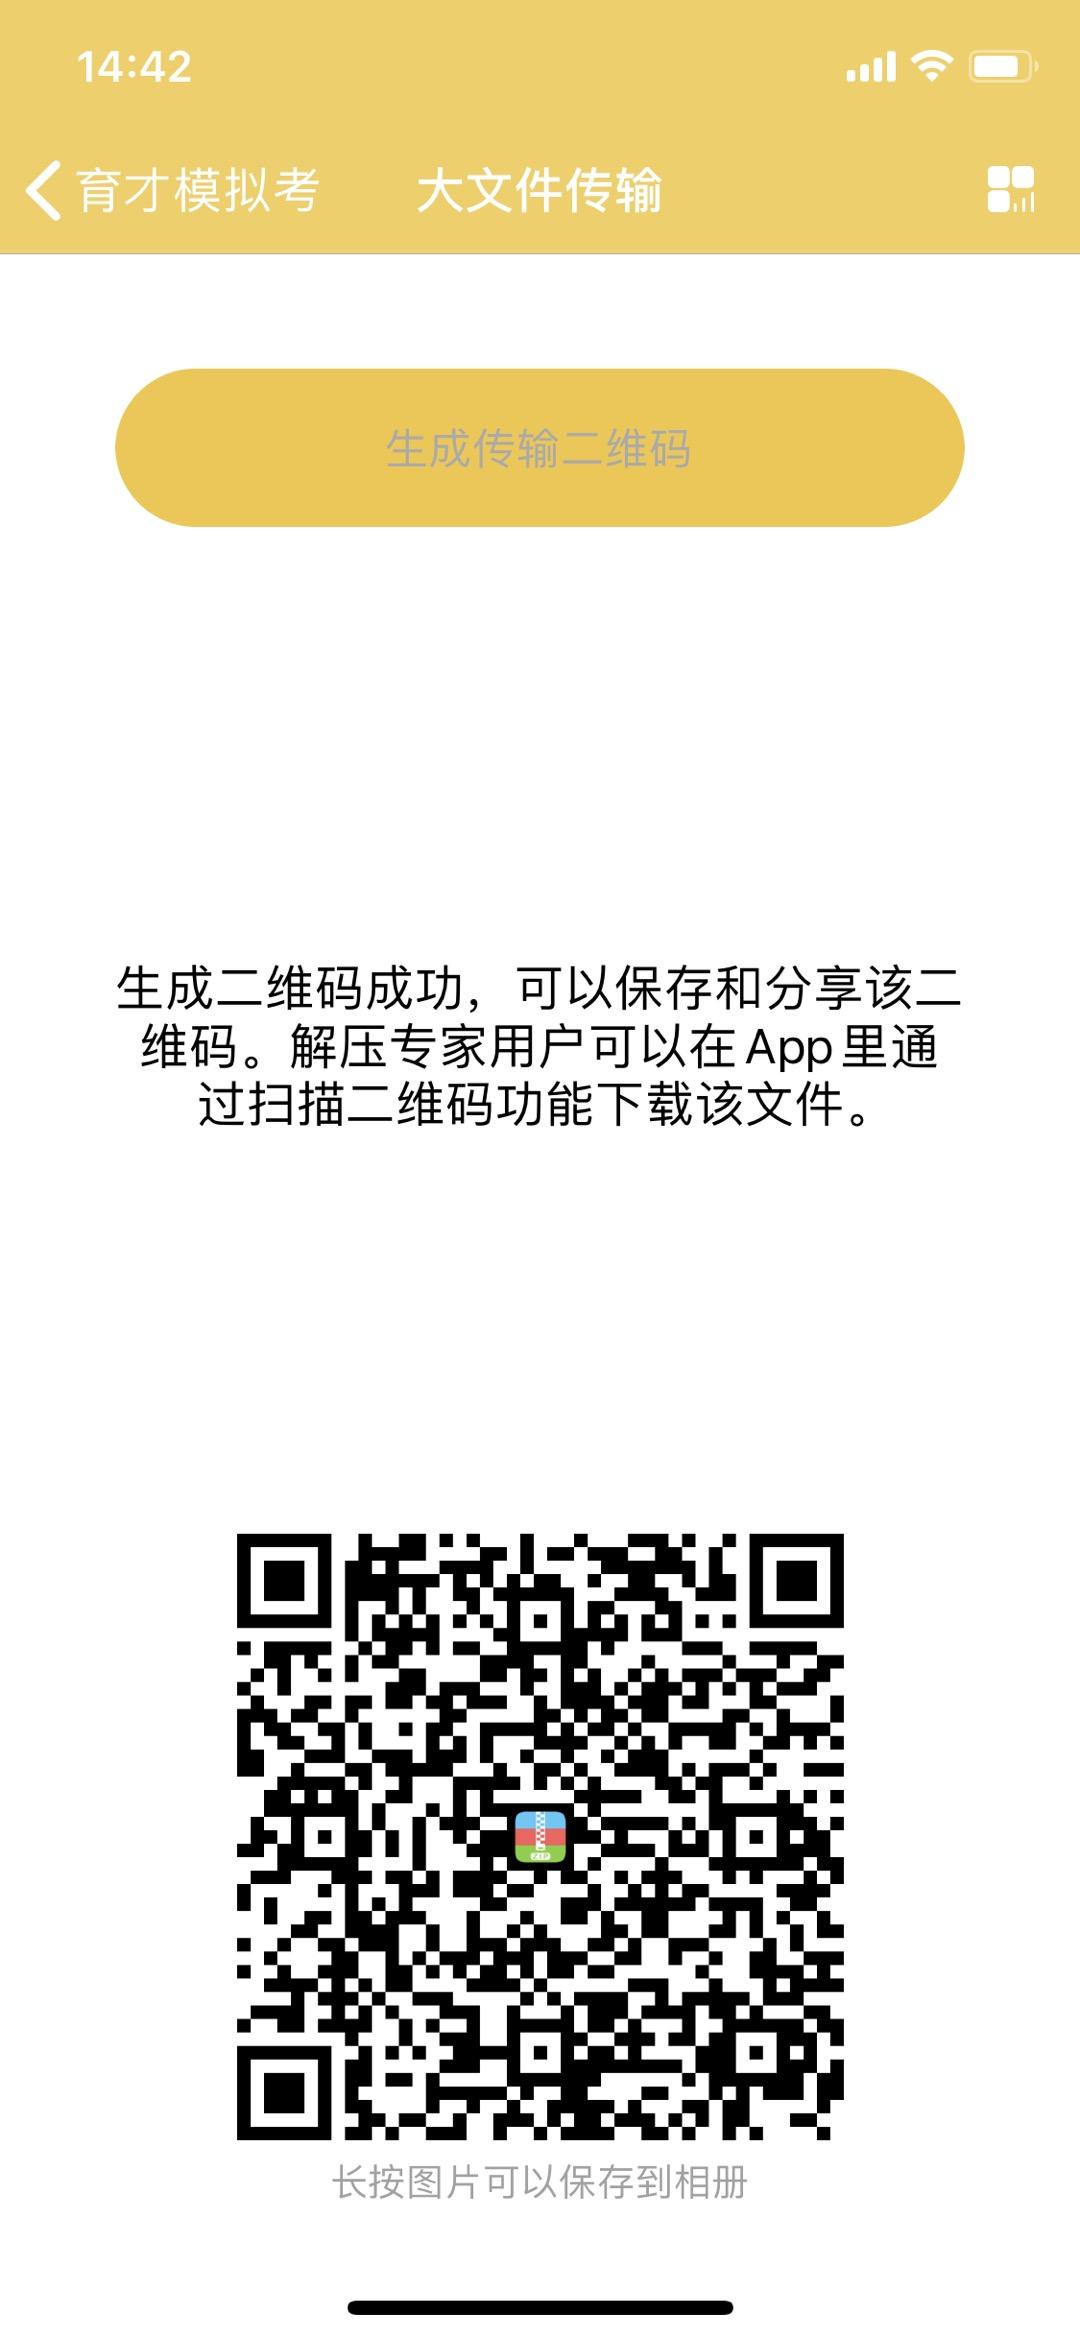 6F0B1498-A6B5-499A-A52D-E9F7C2DE5F6D.jpg